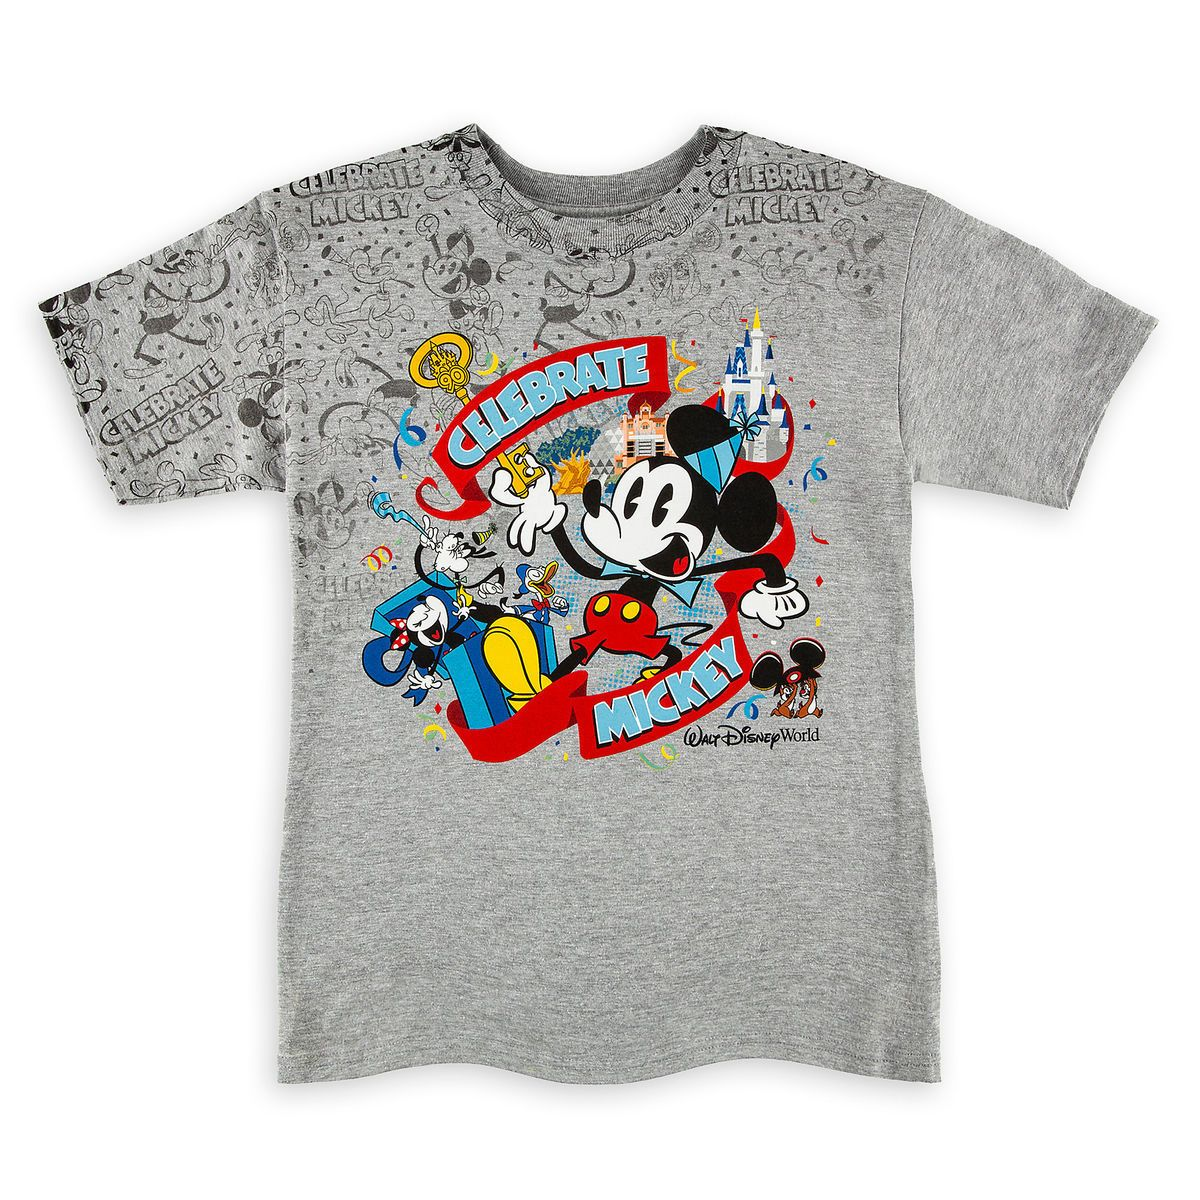 4607b8ed Product Image of Mickey Mouse ''Celebrate'' T-Shirt for Boys - Walt Disney  World # 1